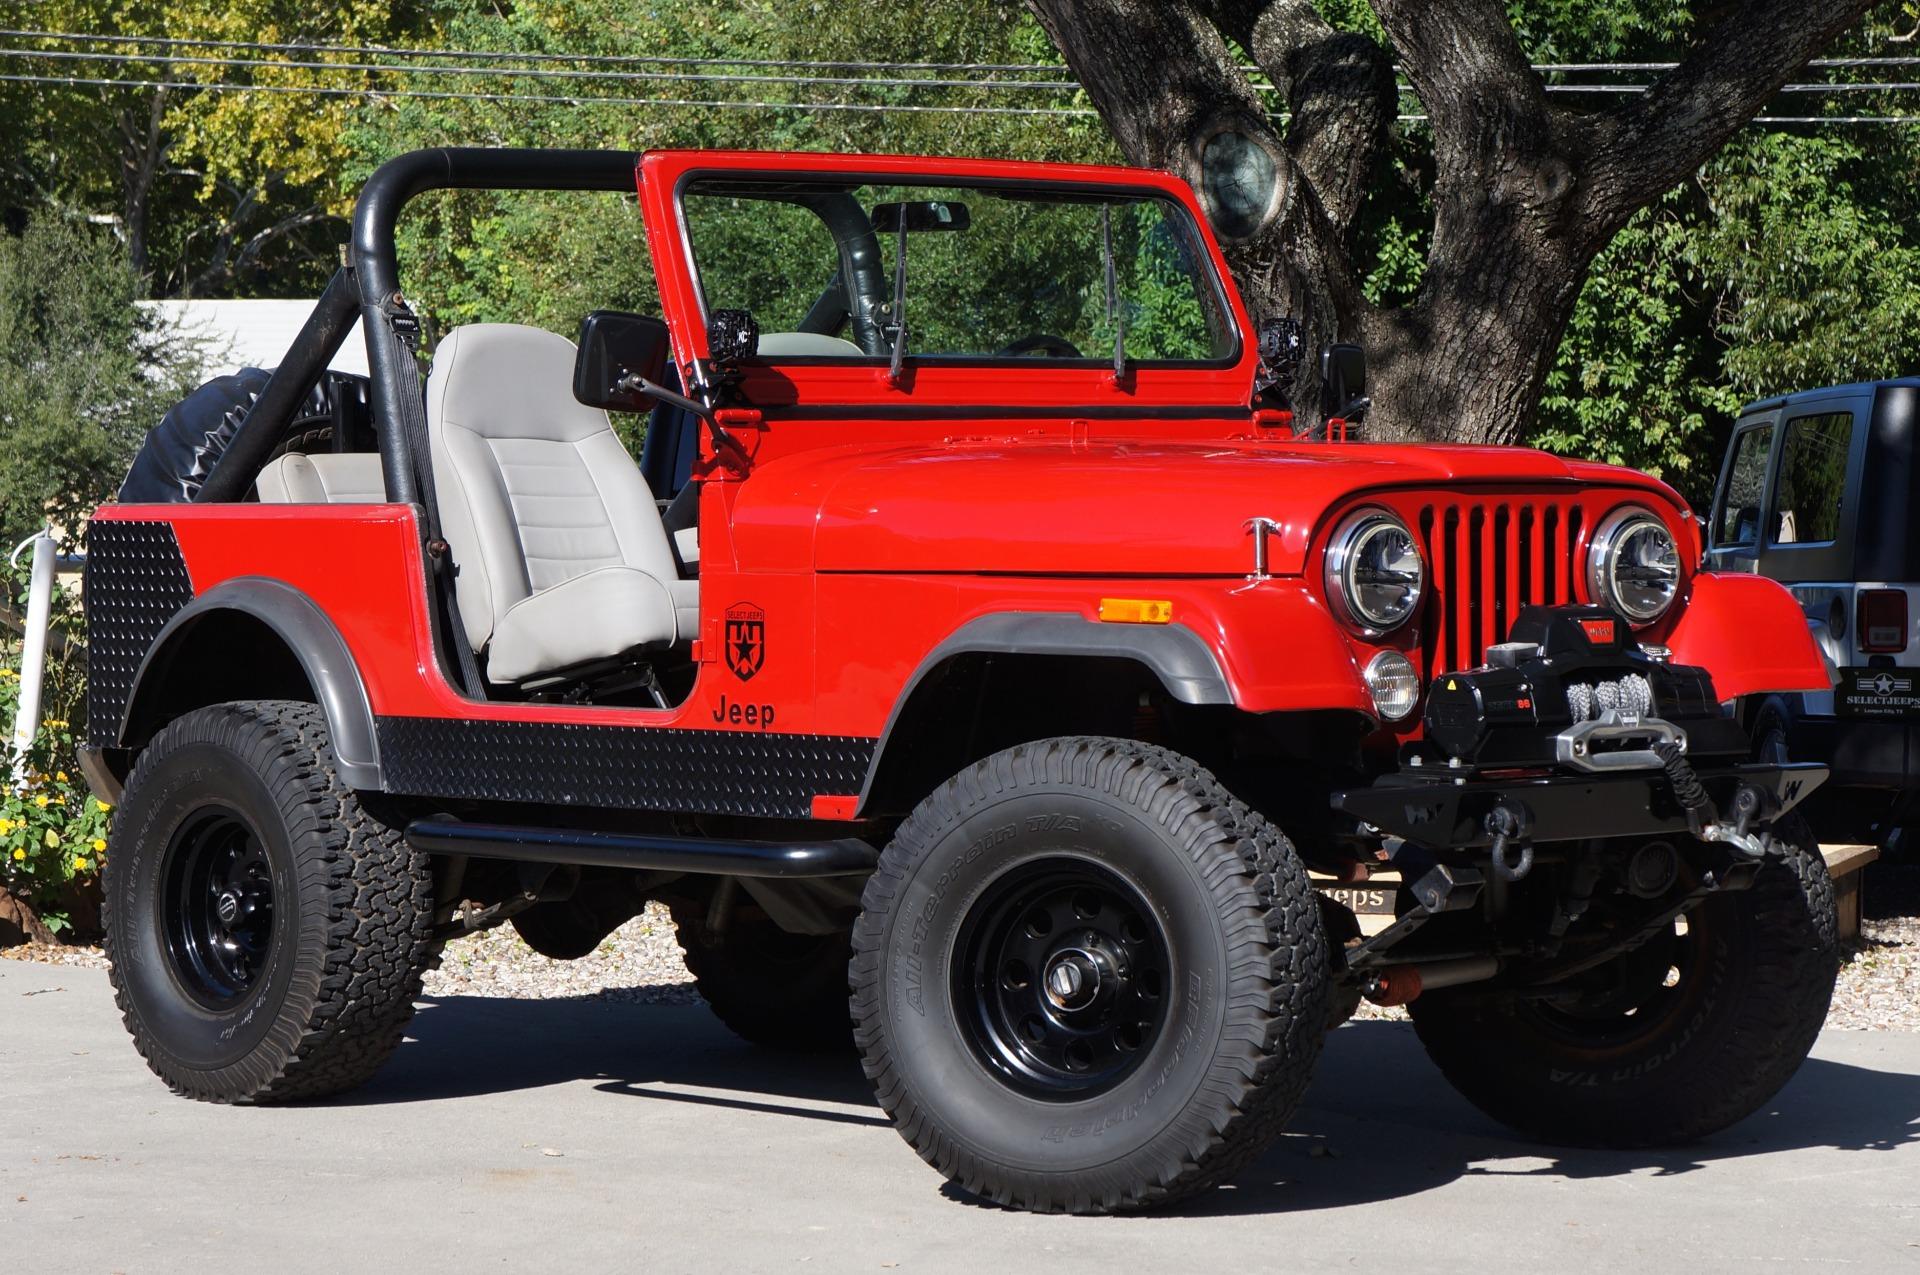 Used-1983-Jeep-CJ-7-4WD-Wagon-CJ7